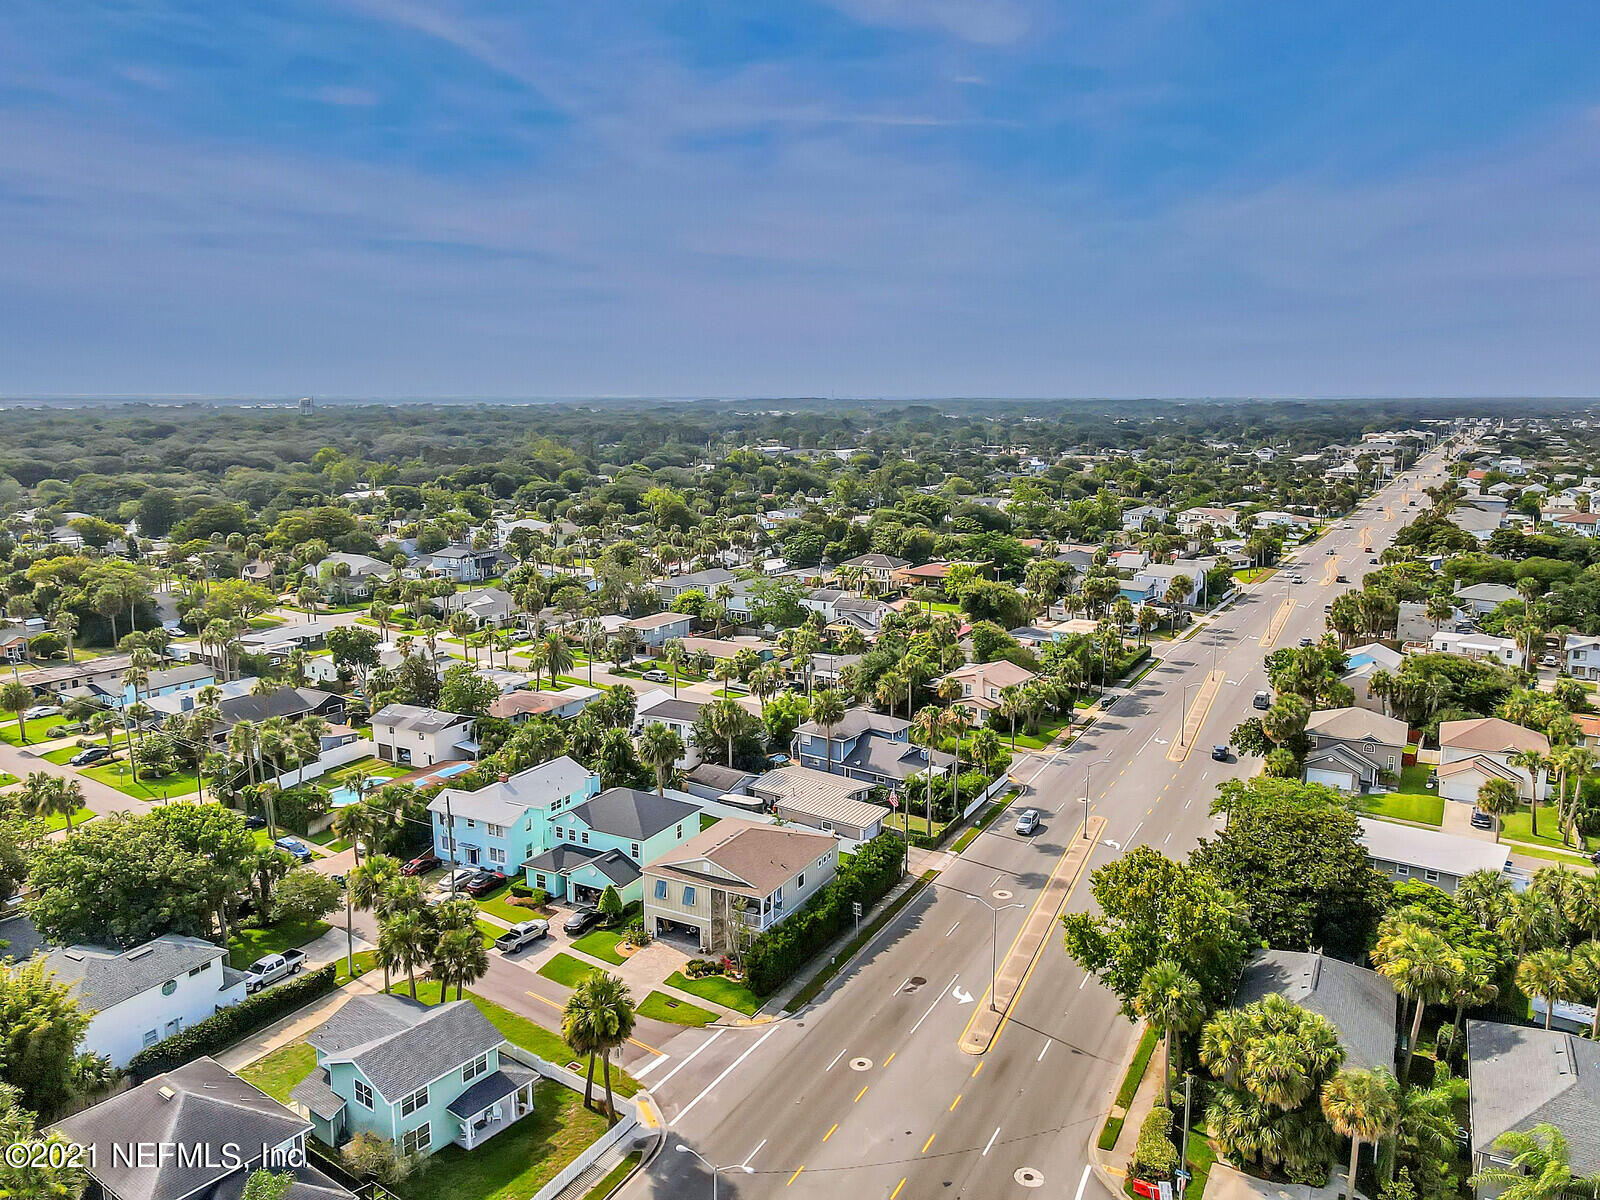 404 MARGARET, NEPTUNE BEACH, FLORIDA 32266, 4 Bedrooms Bedrooms, ,4 BathroomsBathrooms,Investment / MultiFamily,For sale,MARGARET,1117210